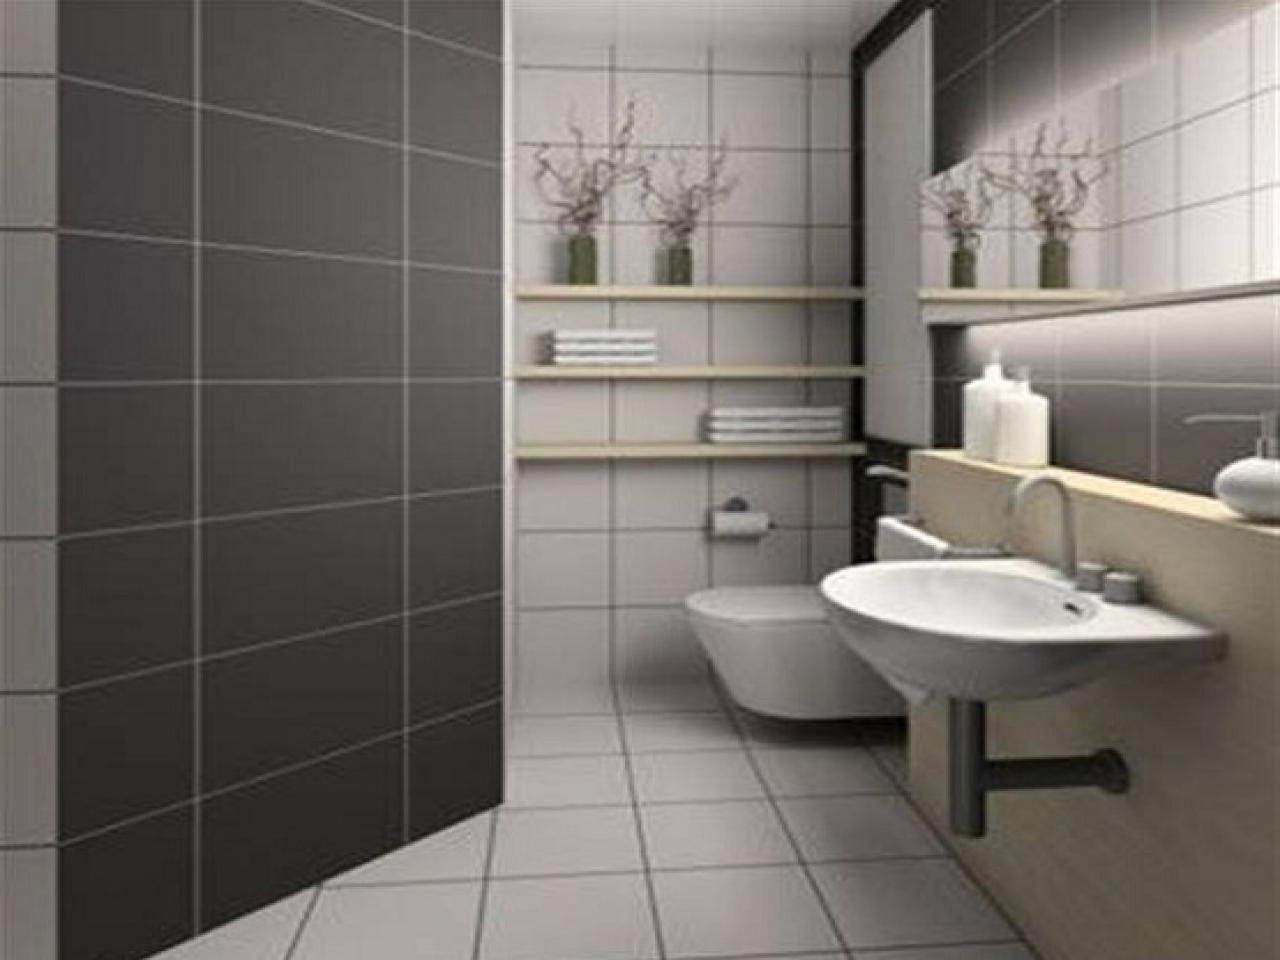 Bathroom tiles colors designs | Hawk Haven